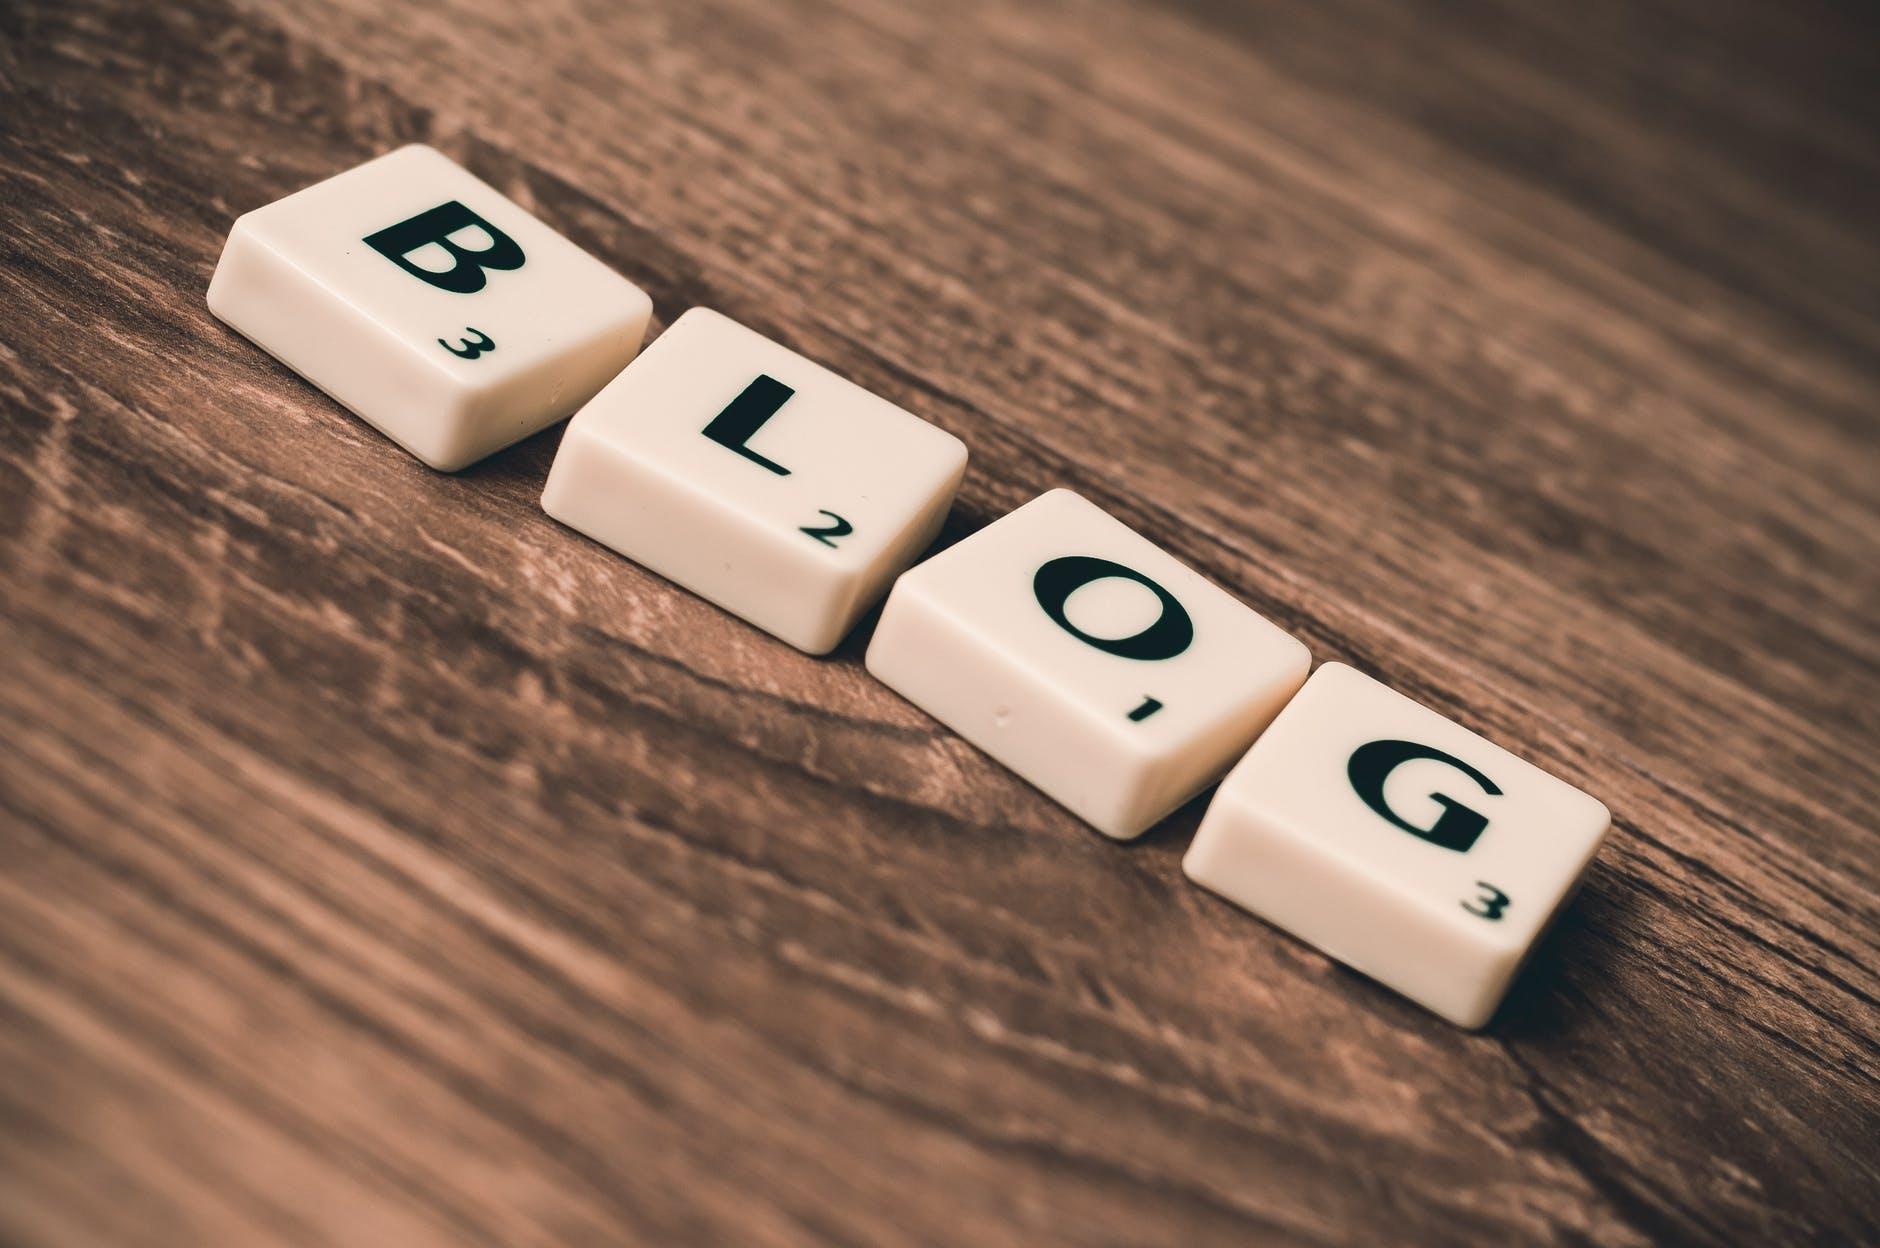 Poate un blog sa iti aduca bani din videochat? Iata raspunsul!